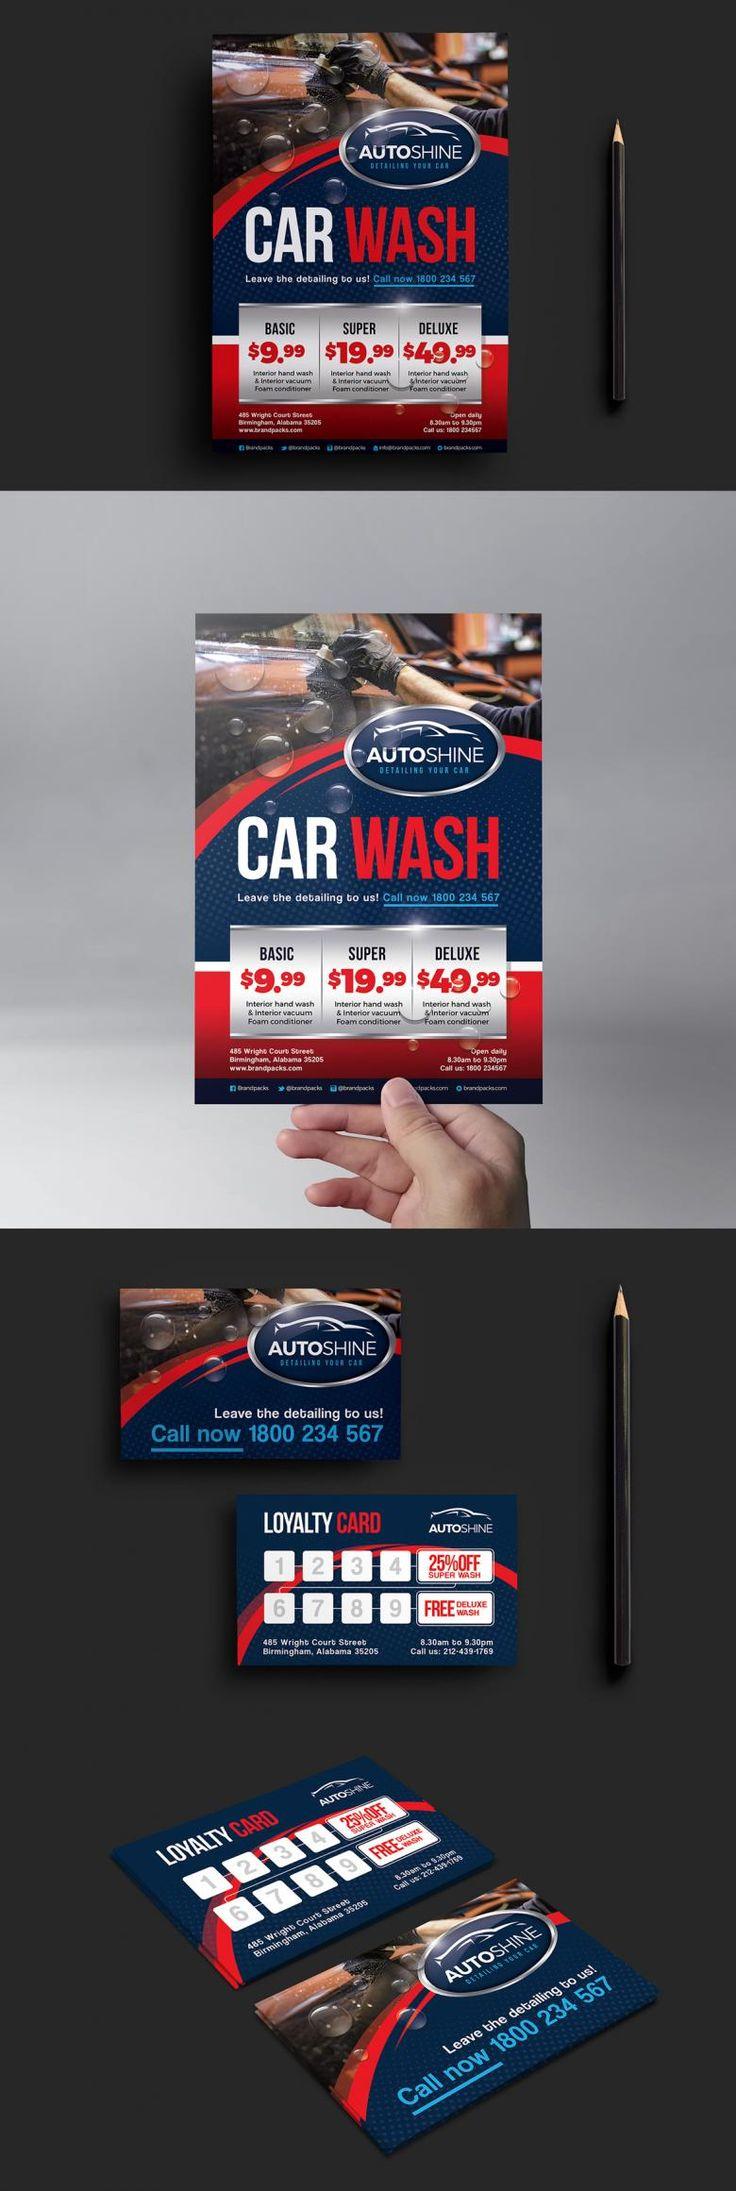 Free Car Wash Templates Mini Pack